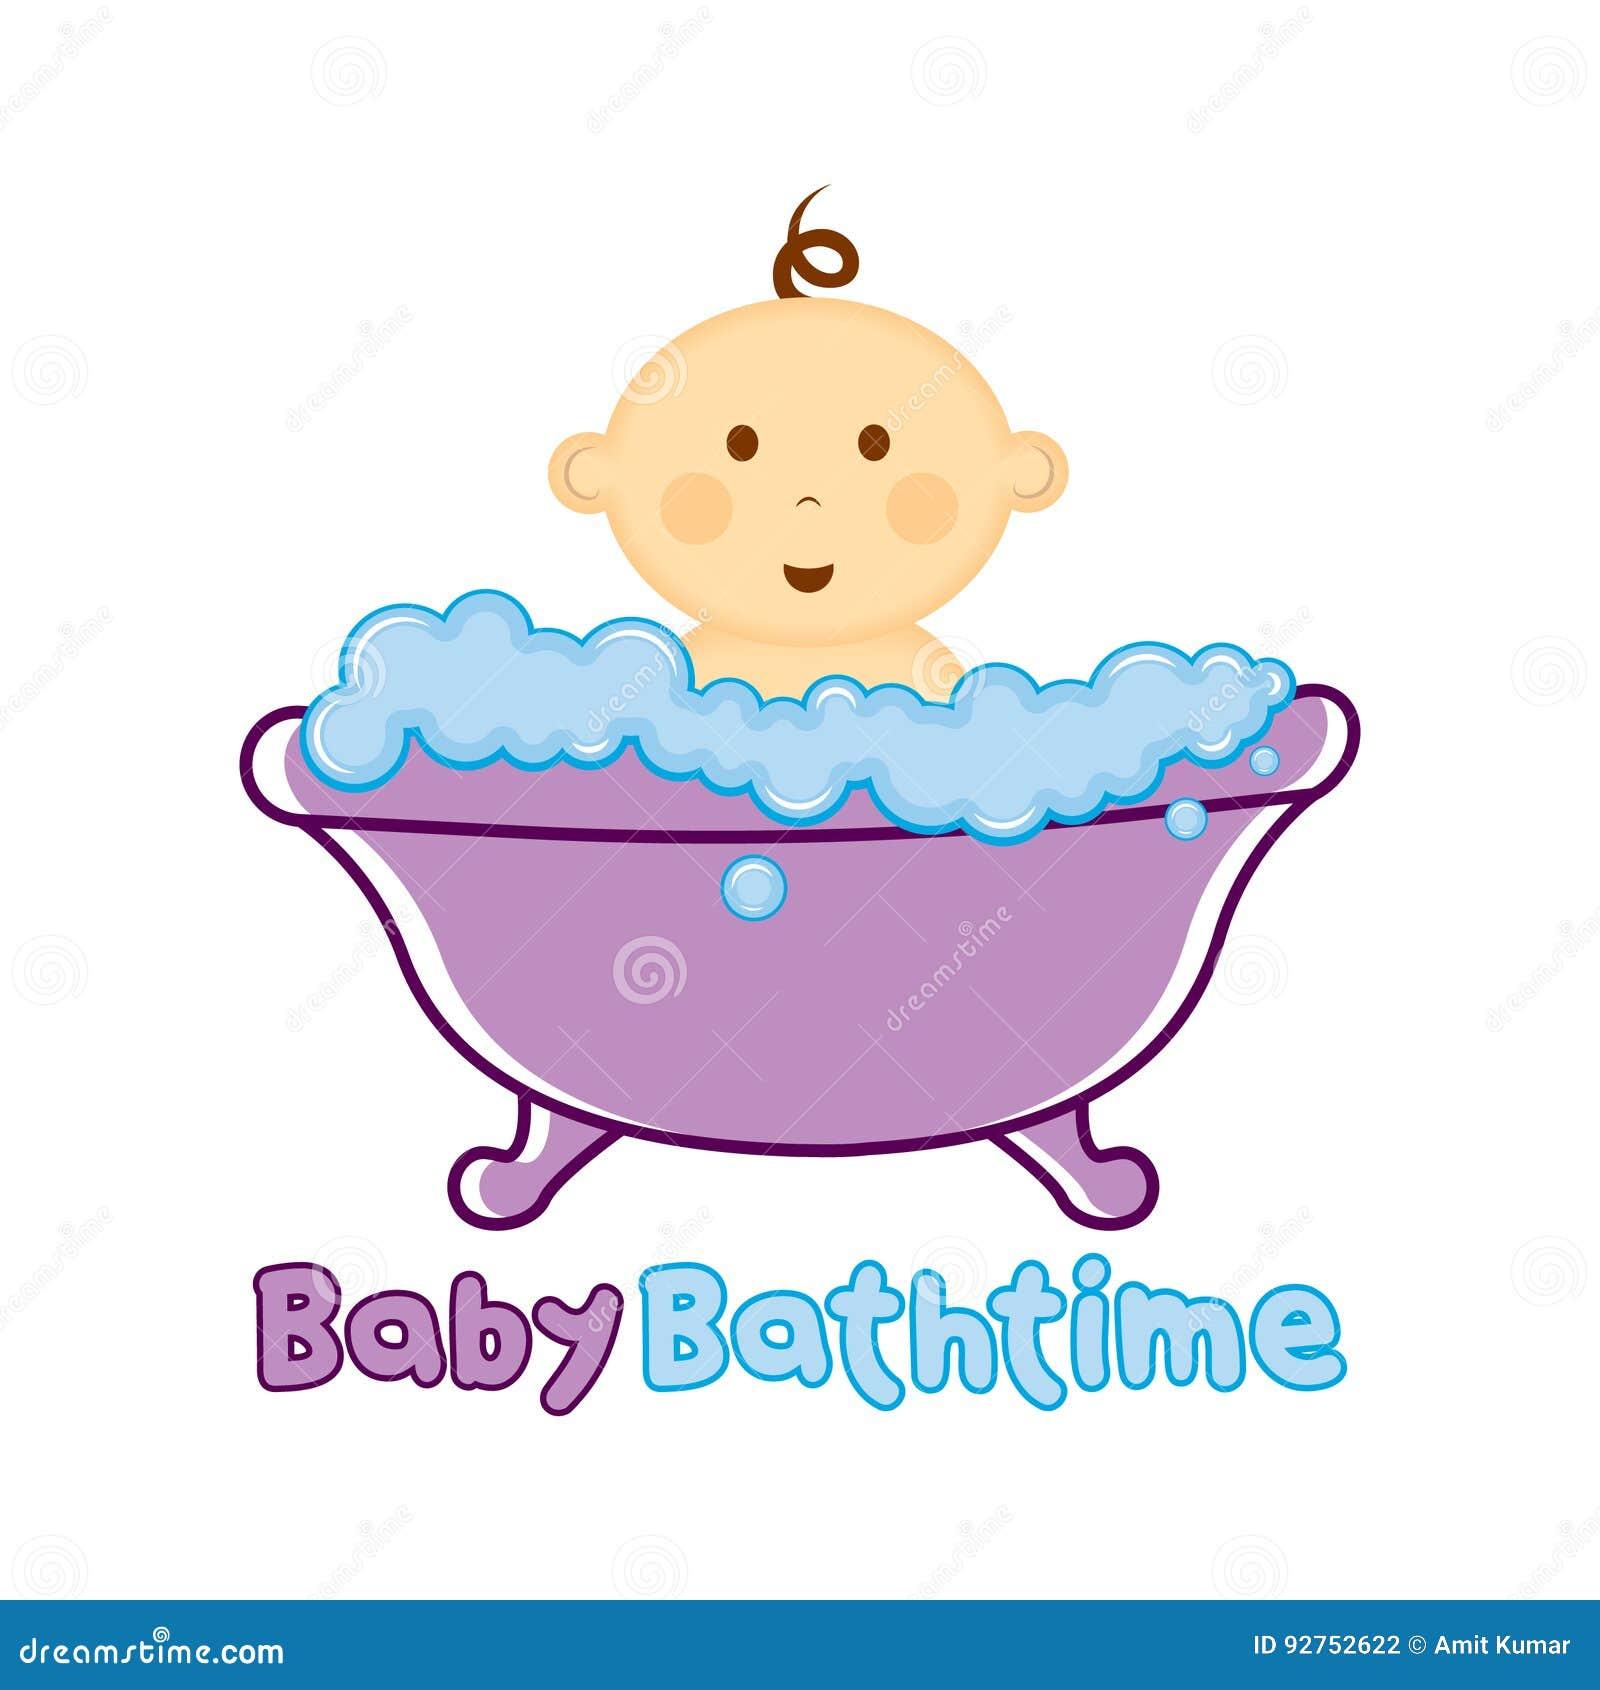 baby bath time logo template  baby bathing logo  baby